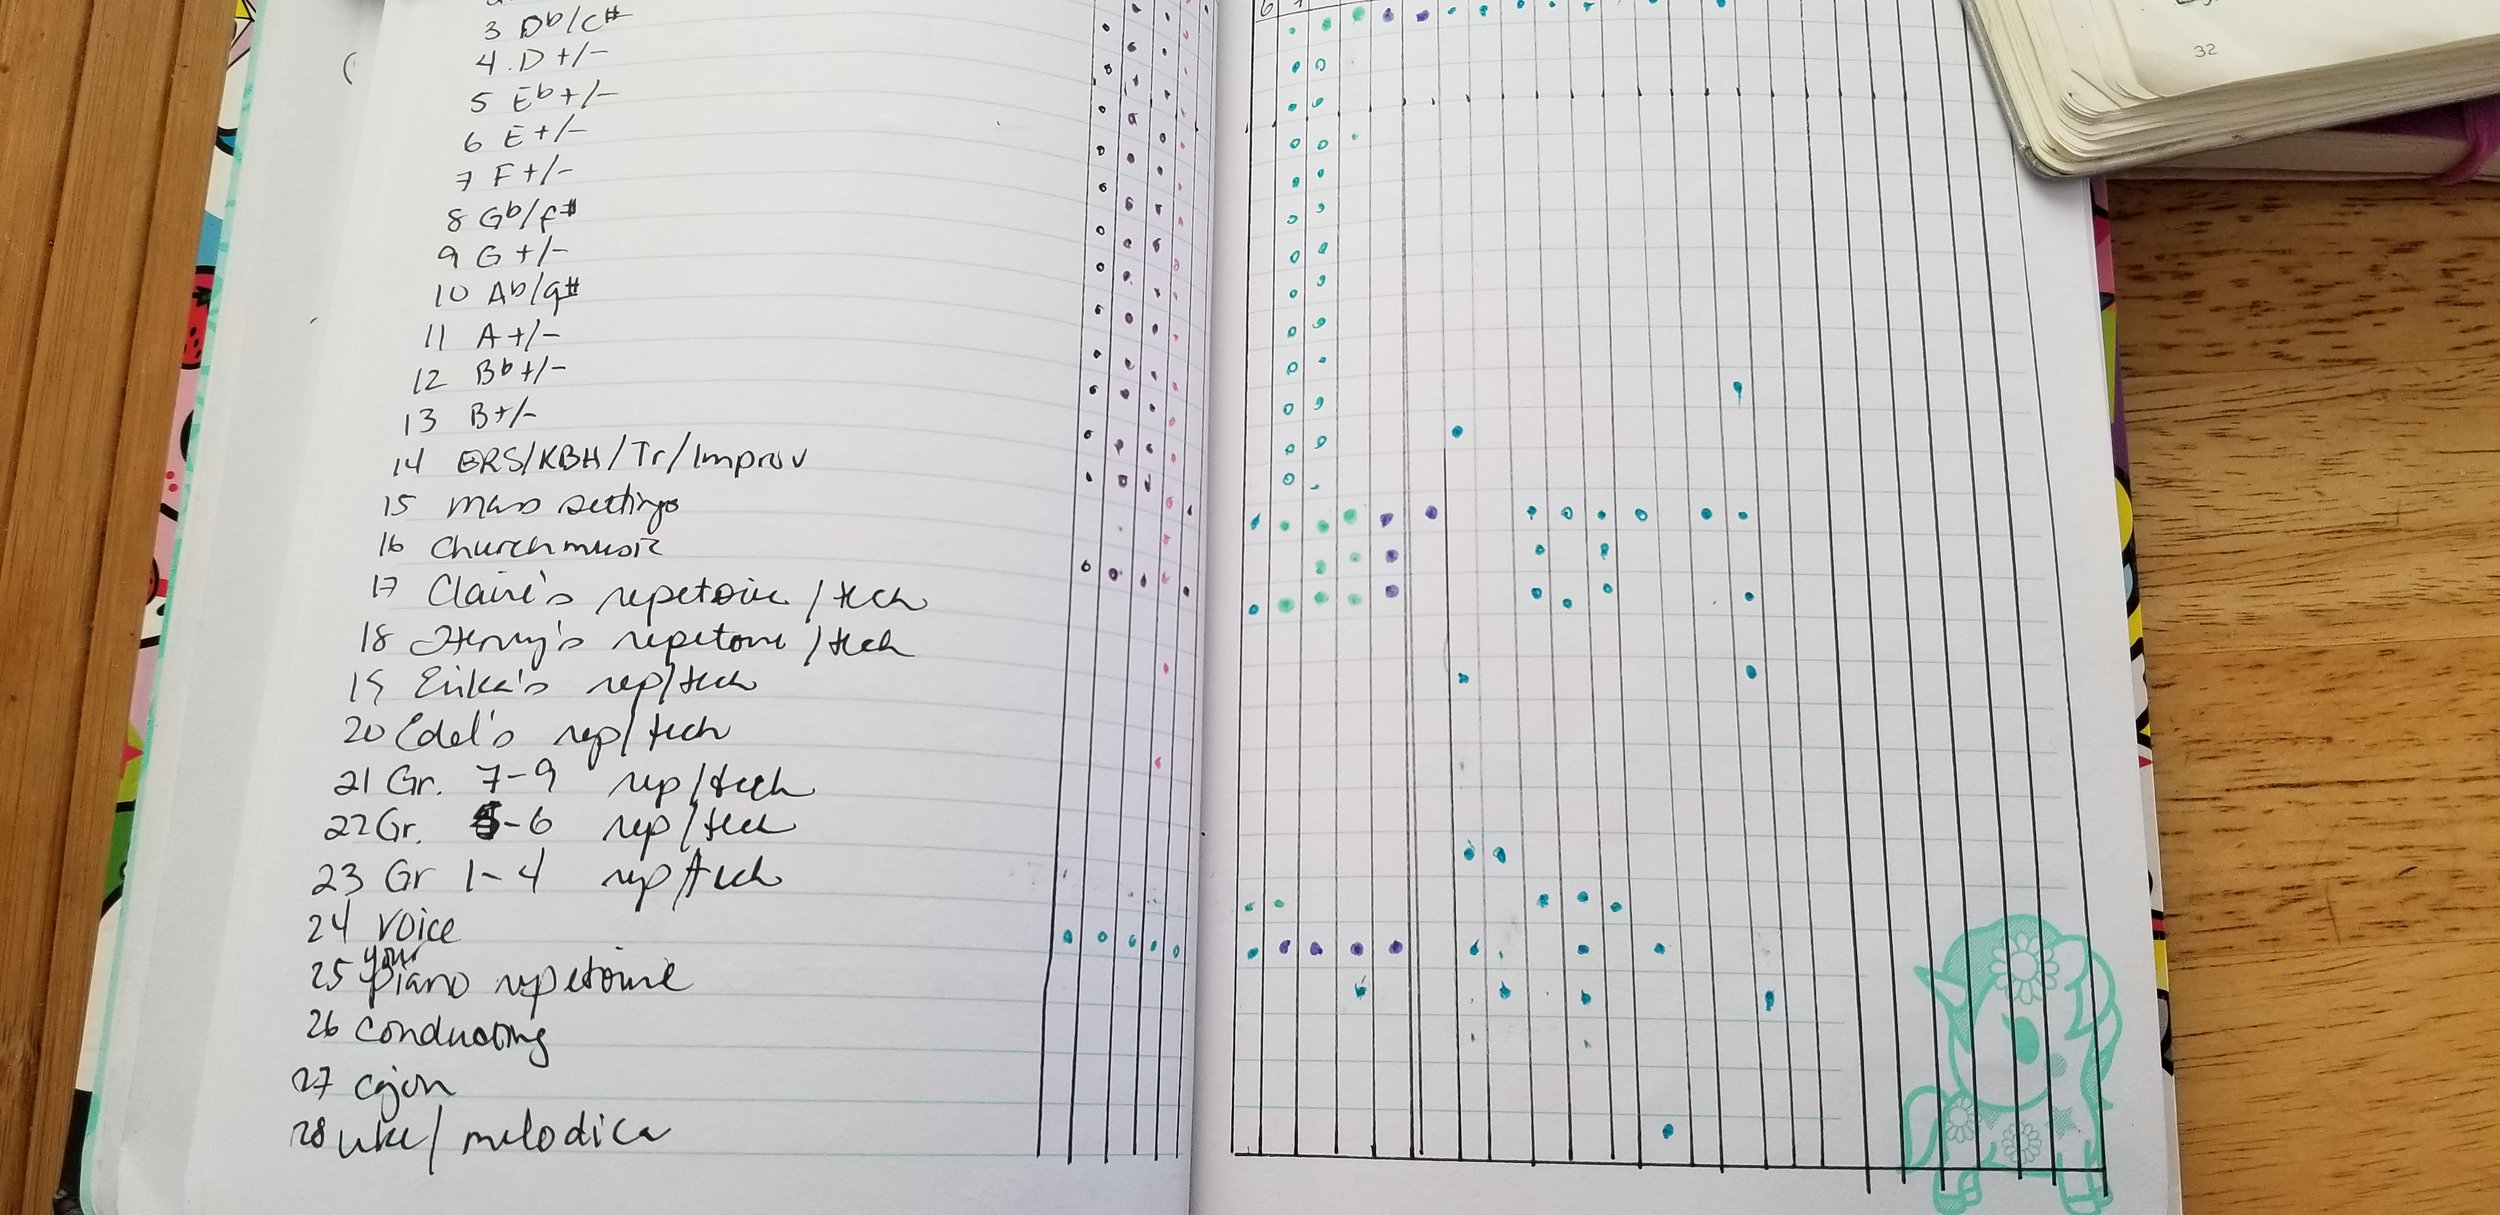 February 2019 Music Practice Tracker